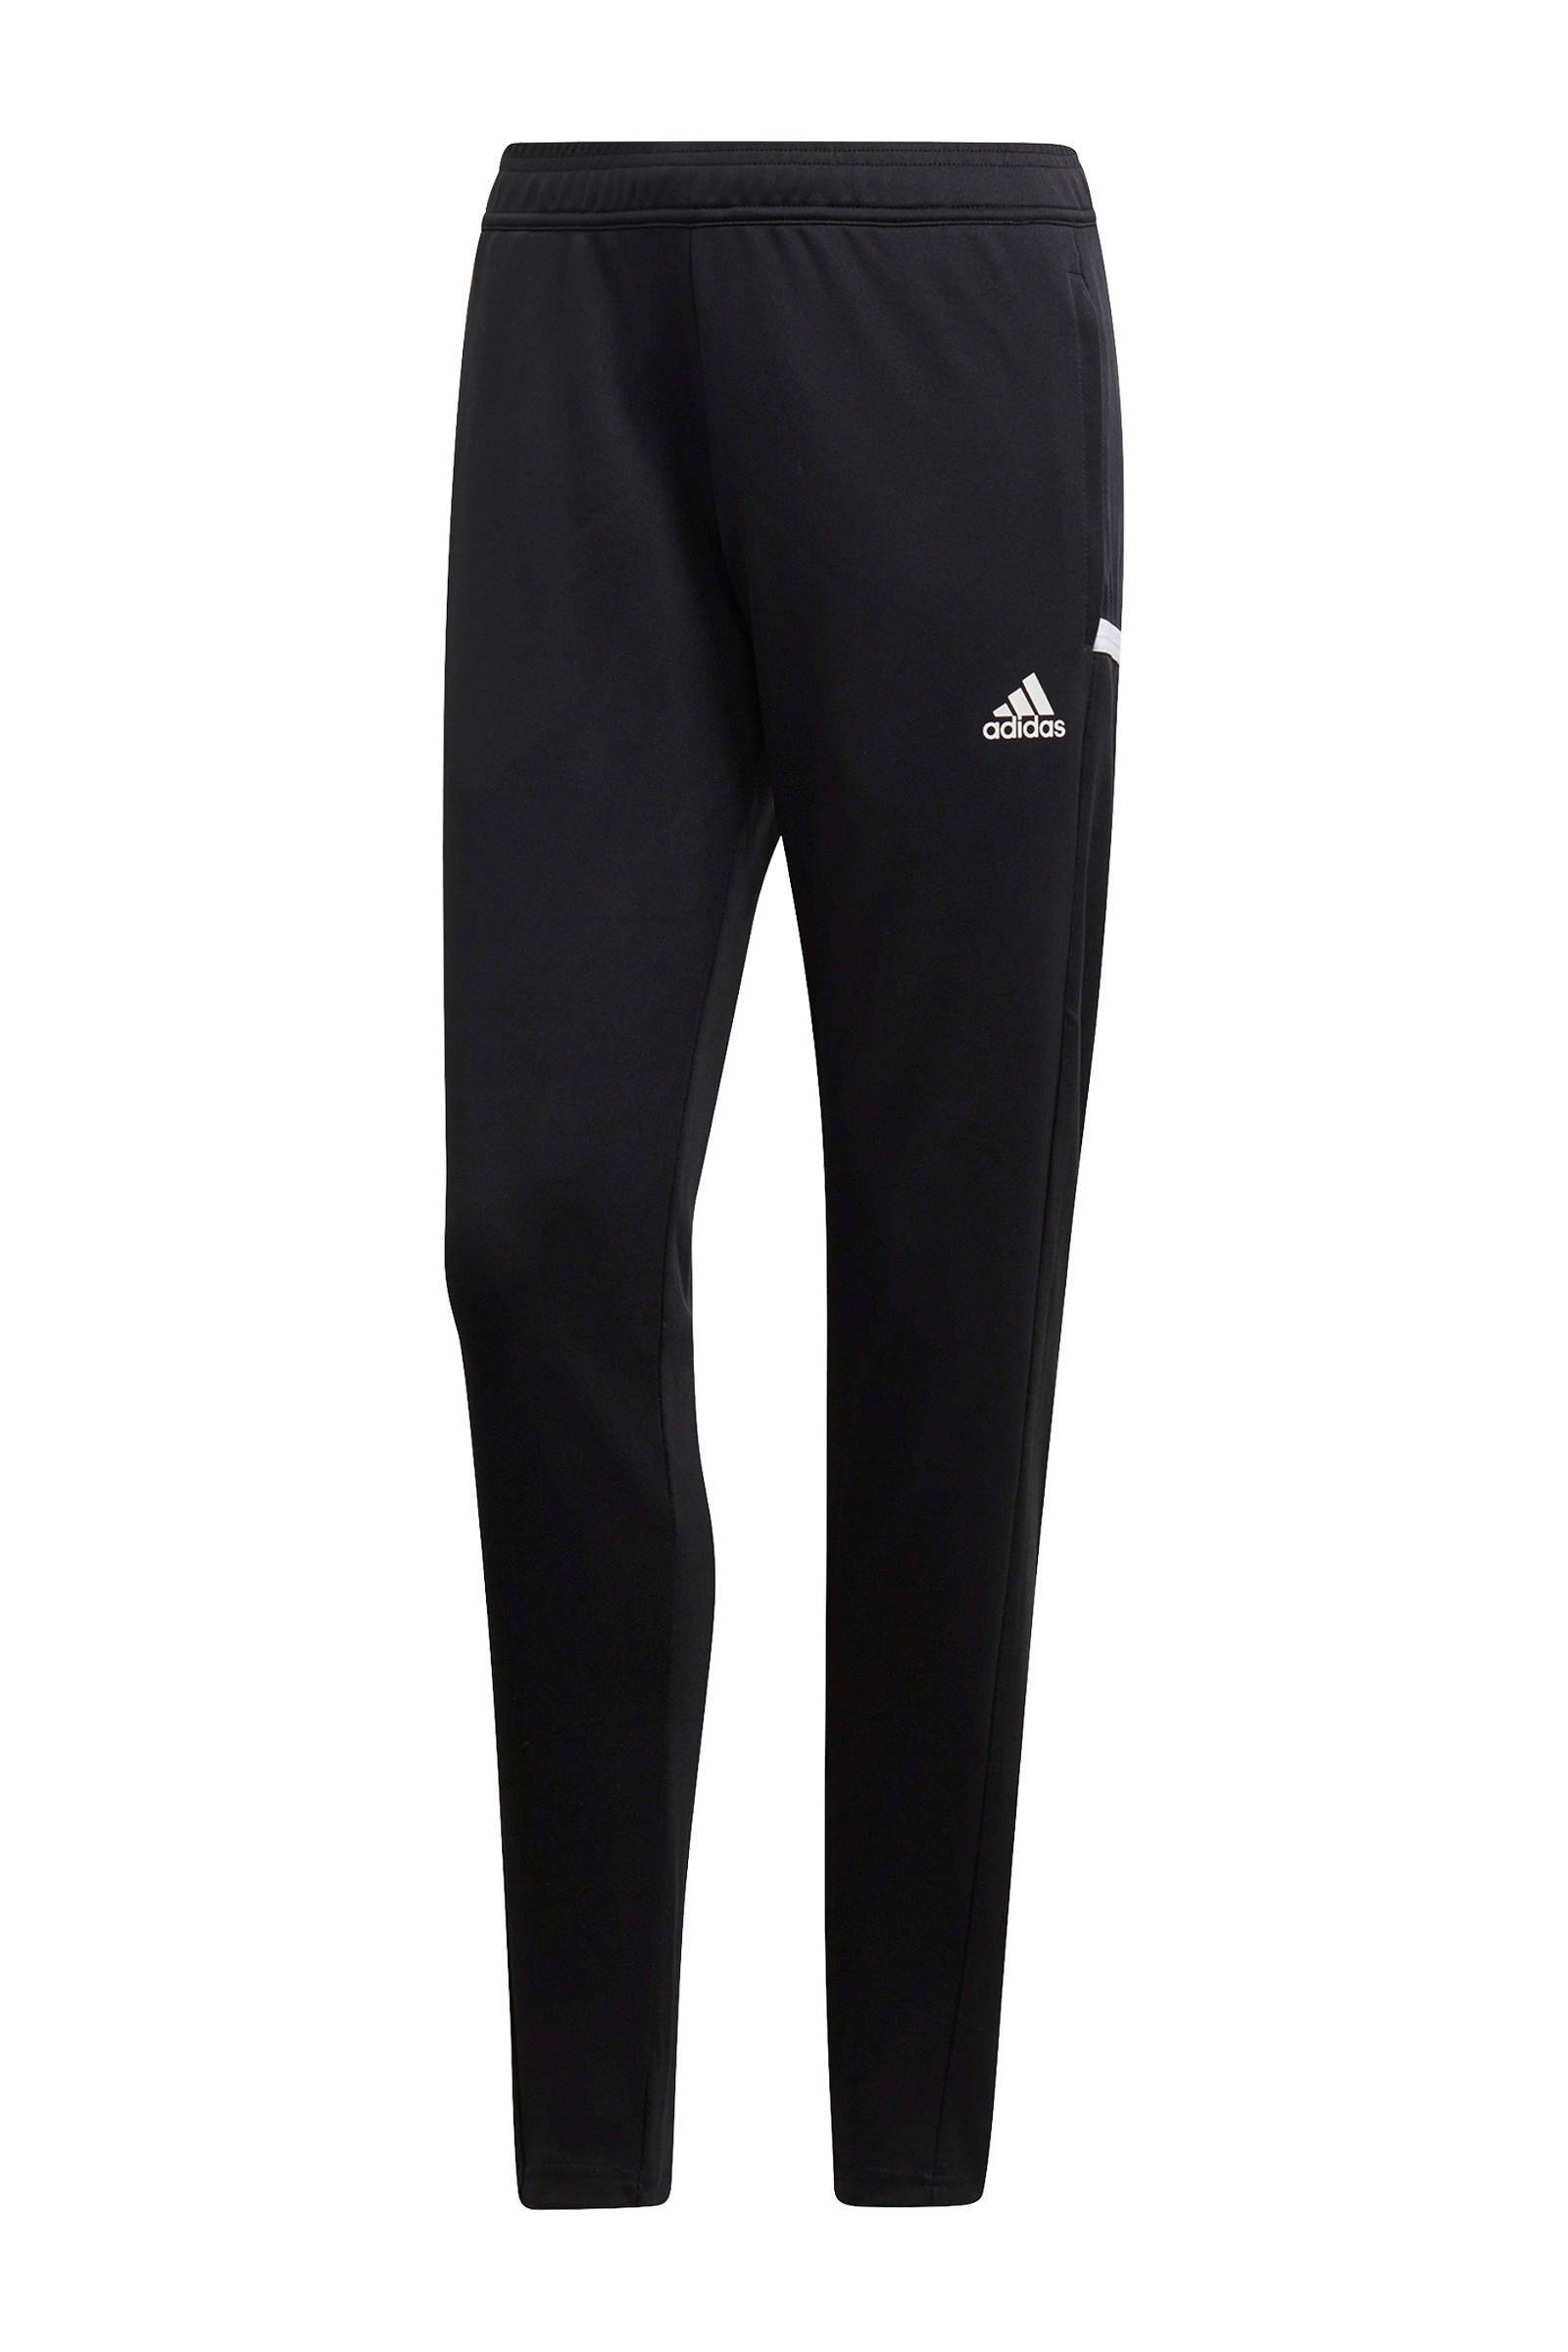 40c7cfa00de00f adidas-performance-sportbroek-zwart-4060515013212.jpg